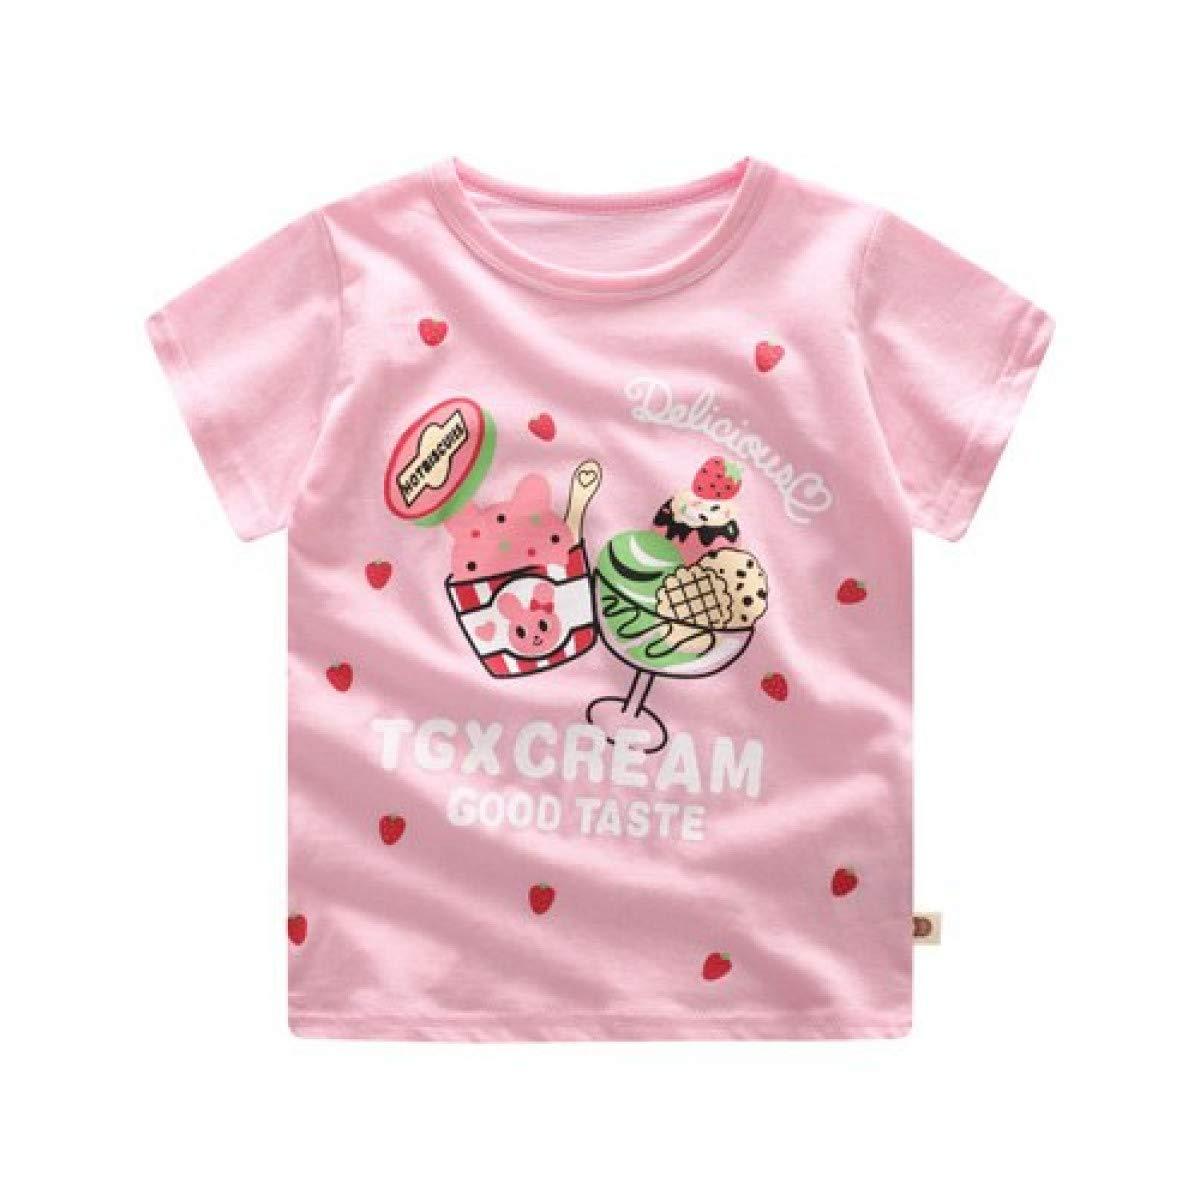 Baby Children Space Rockets Print Kids Baby Boy Tops Short Sleeve T-Shirt Summer Tee